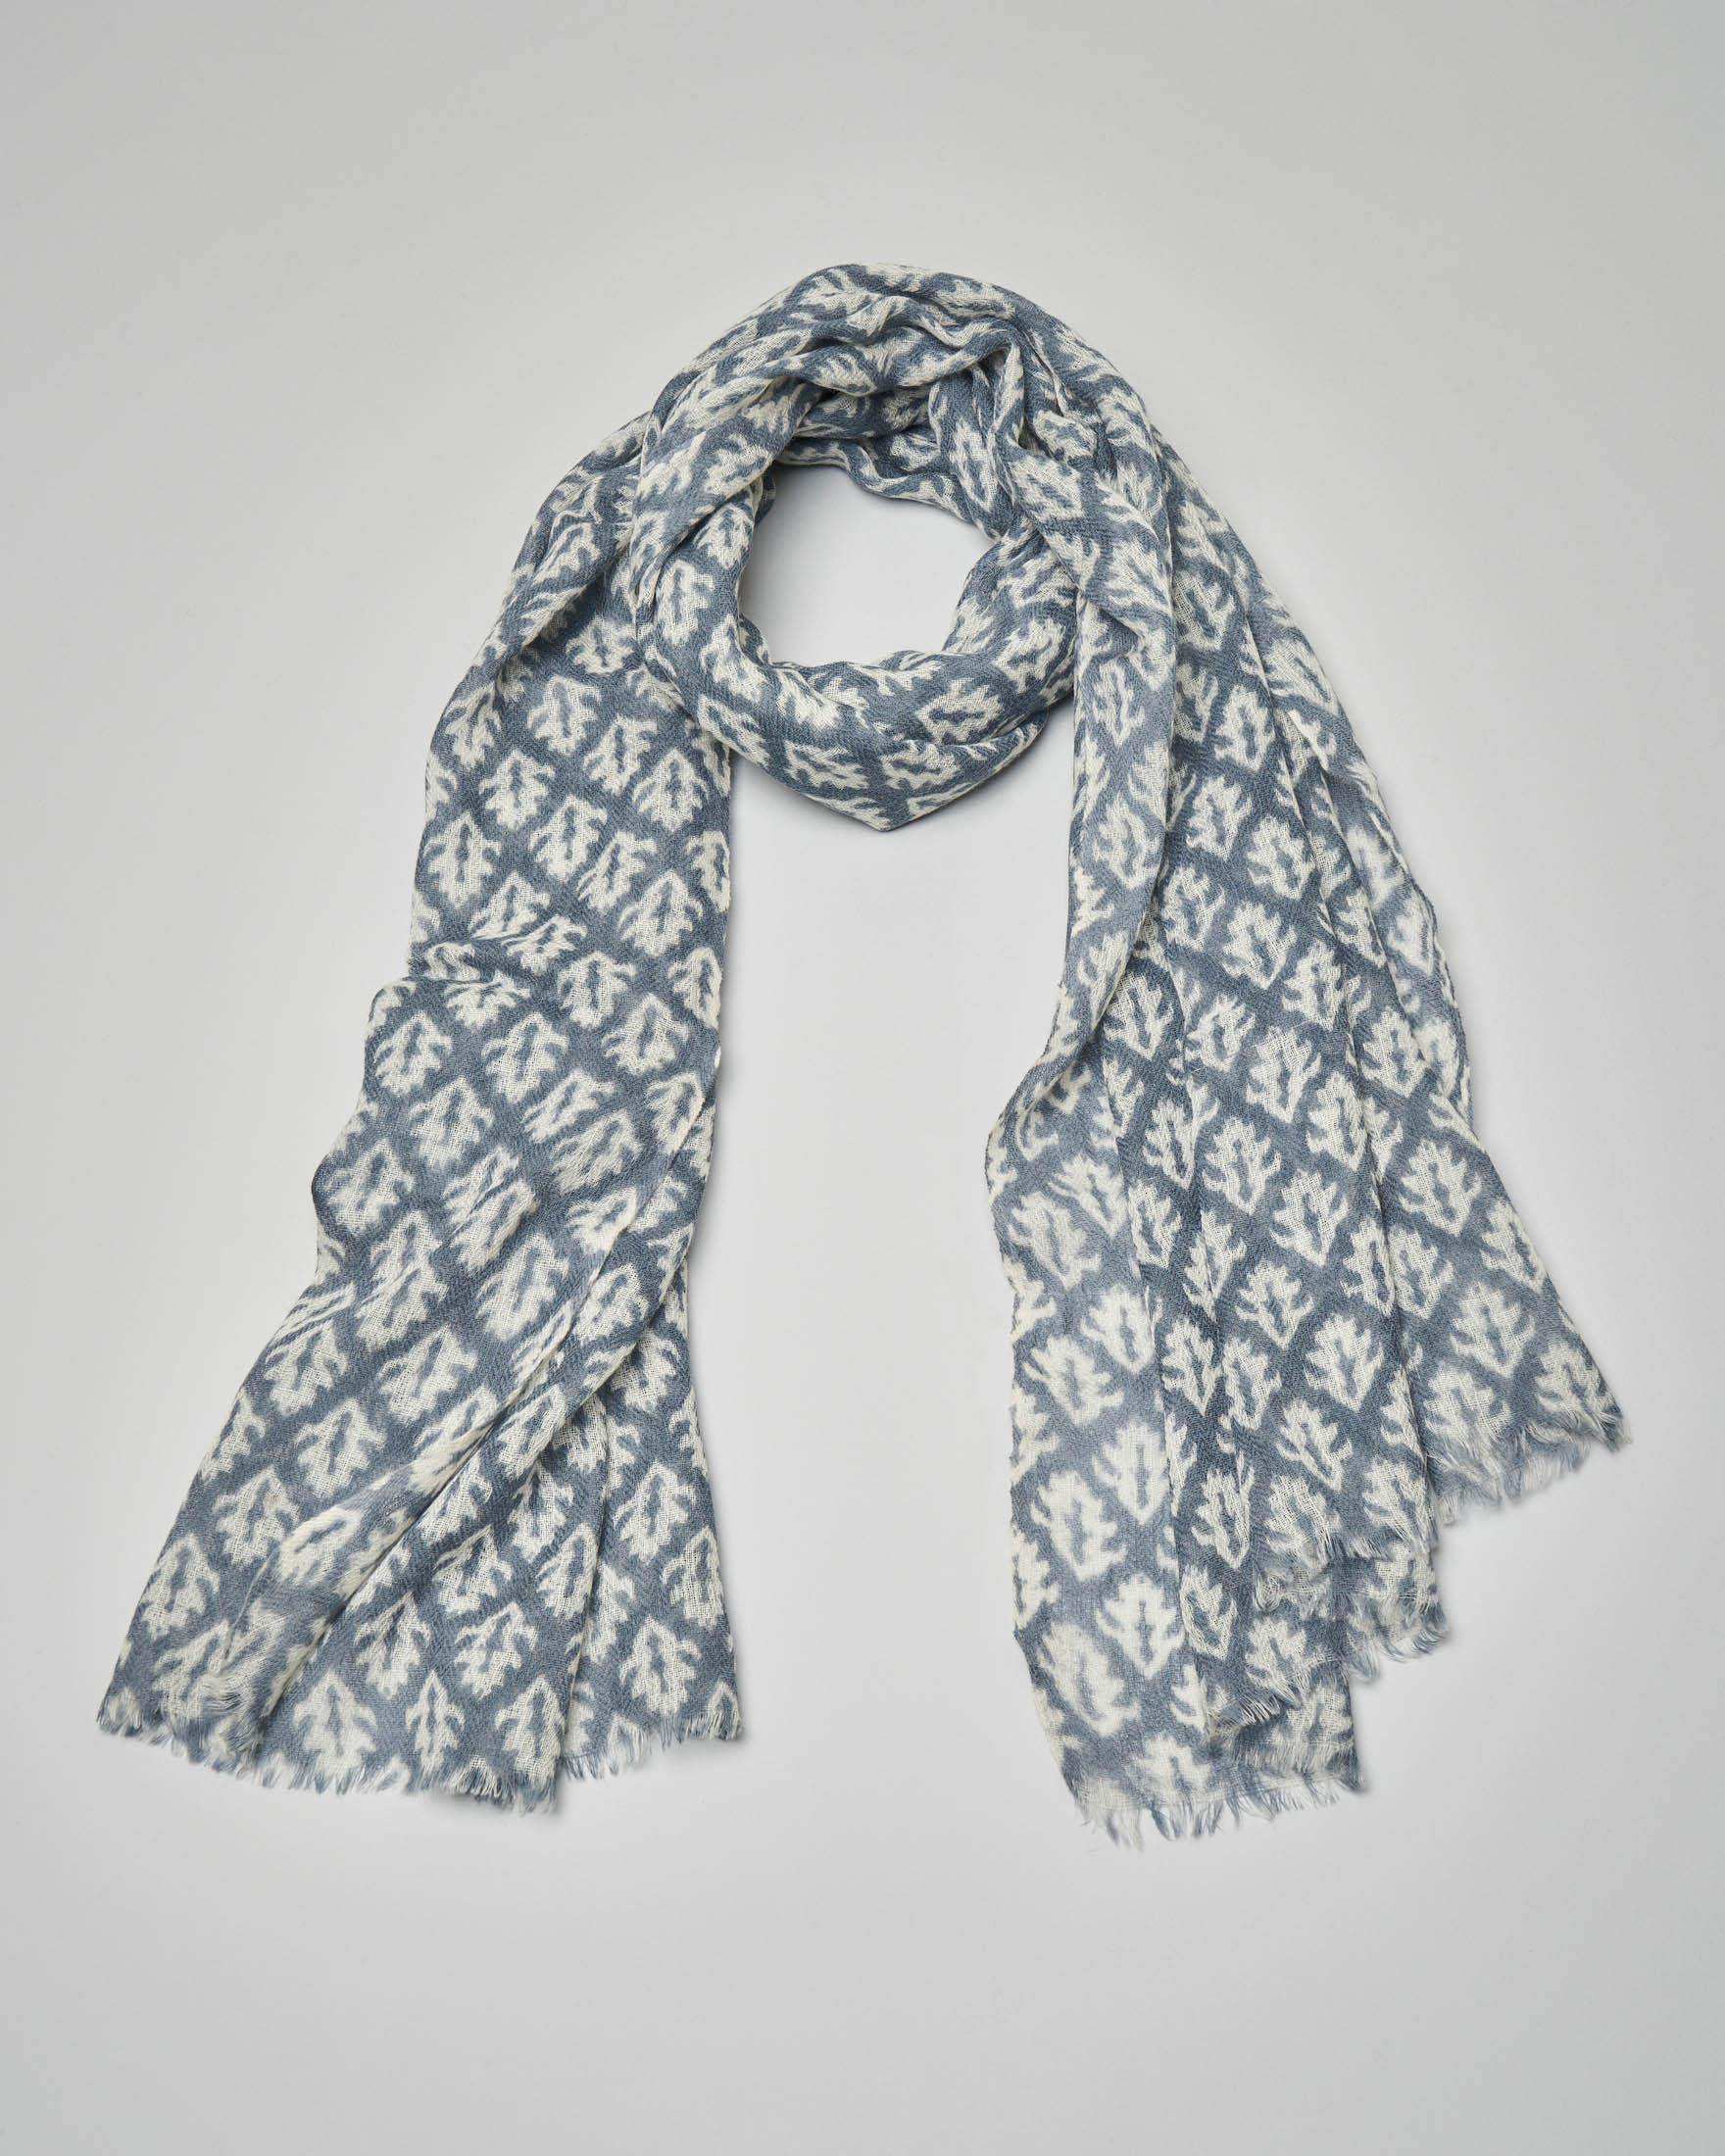 Sciarpa in lana azzurra a fantasia foliage bianca